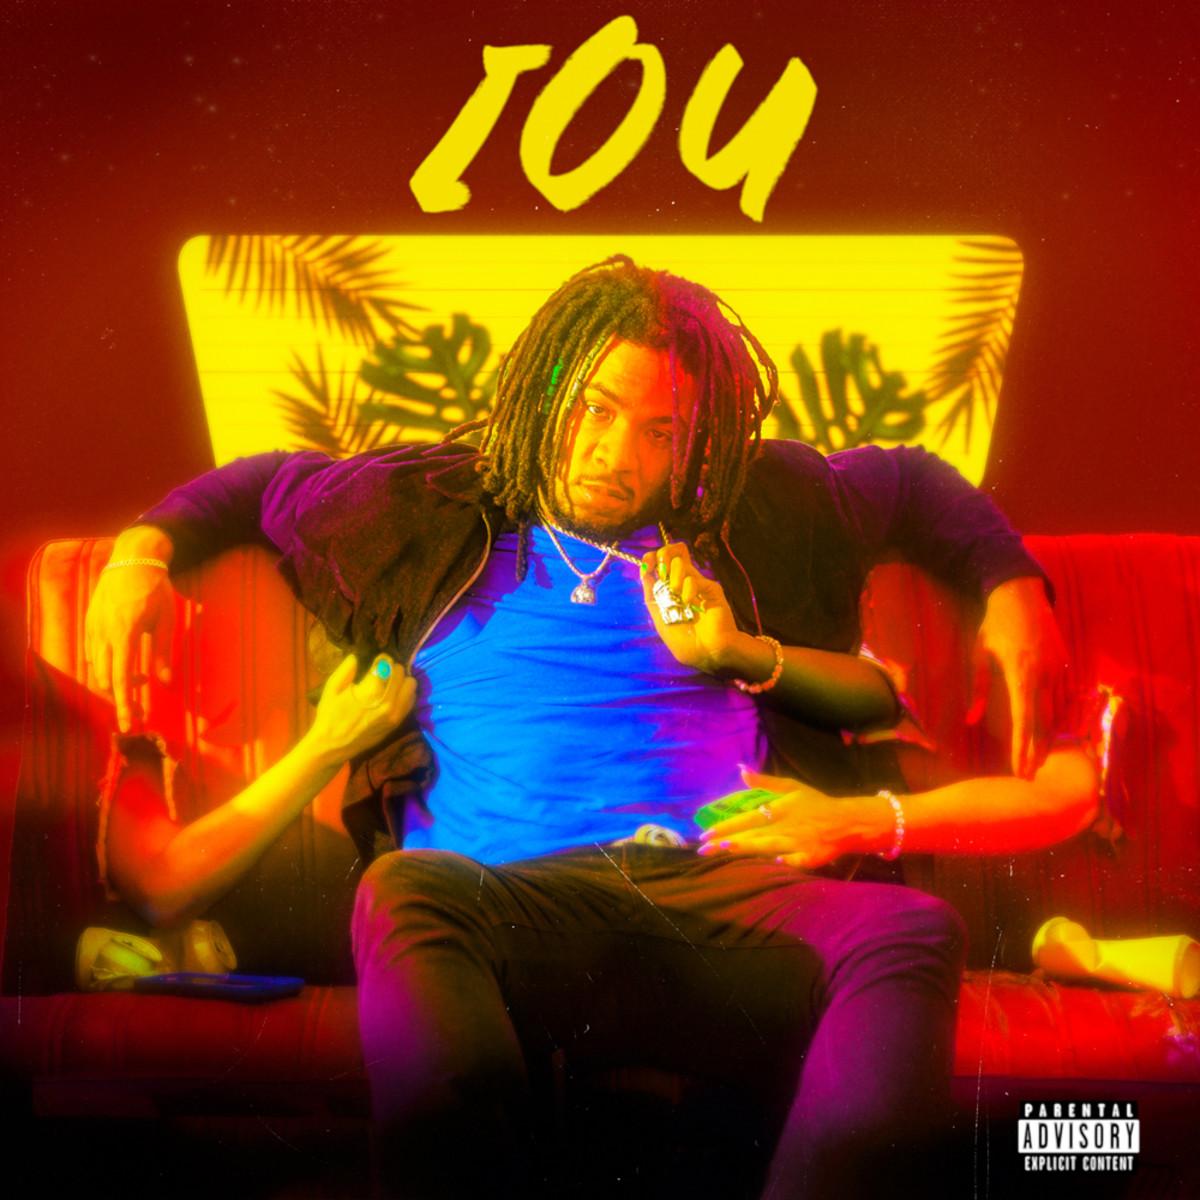 YGTUT 'I.O.U' artwork